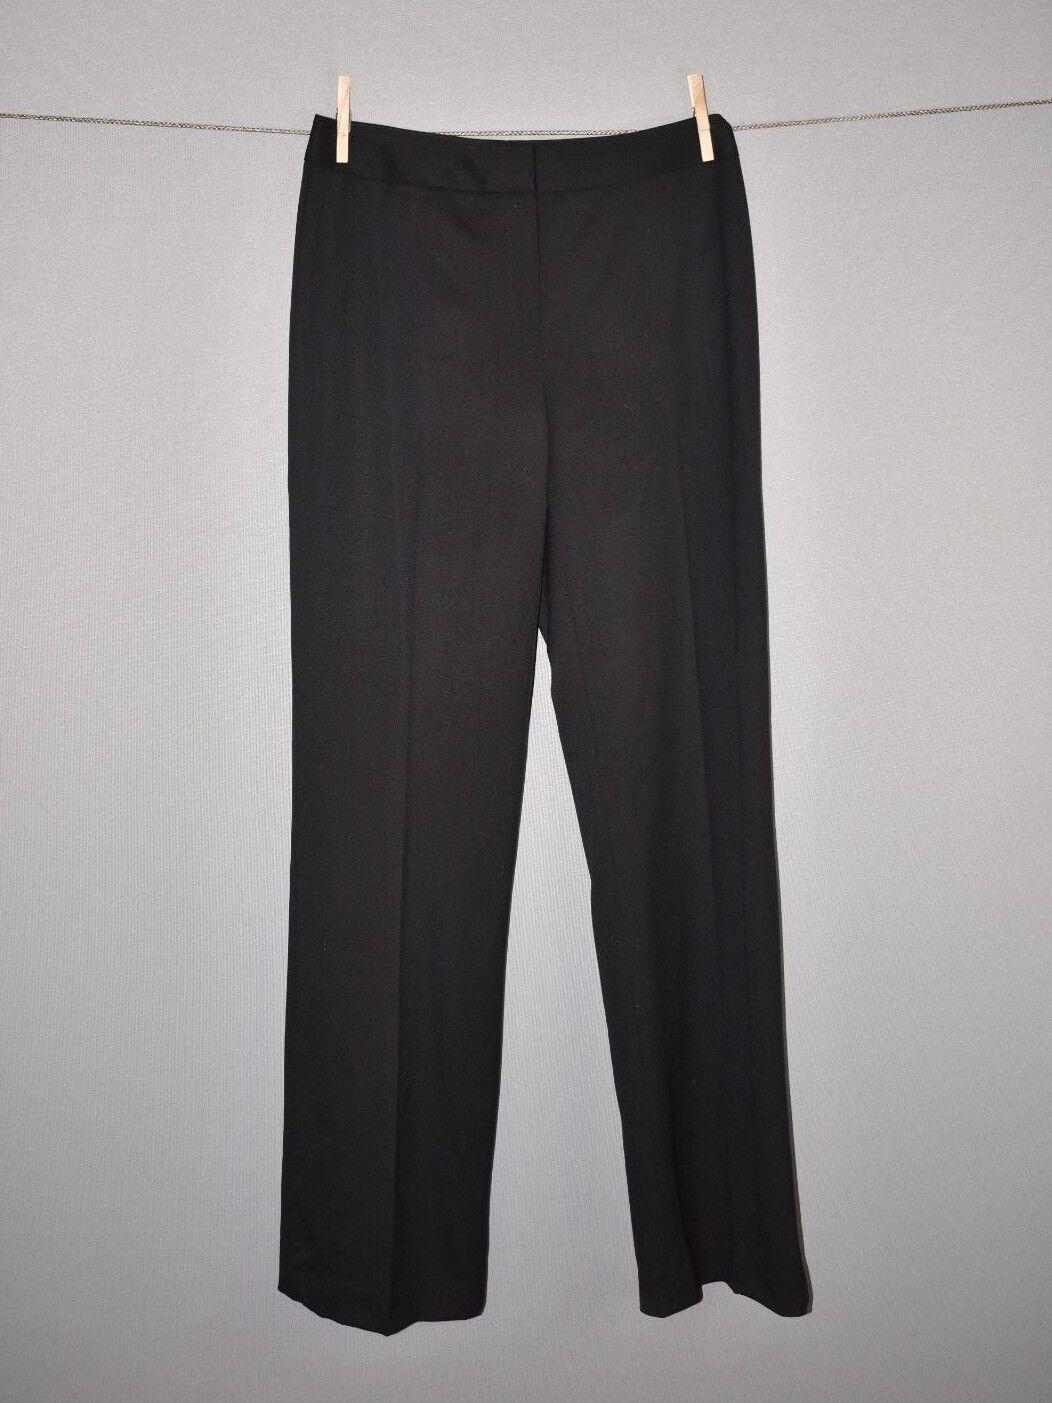 LAFAYETTE 148 NEW YORK NEW  378 Italian Stretch Wool Trouser Pant Size 2